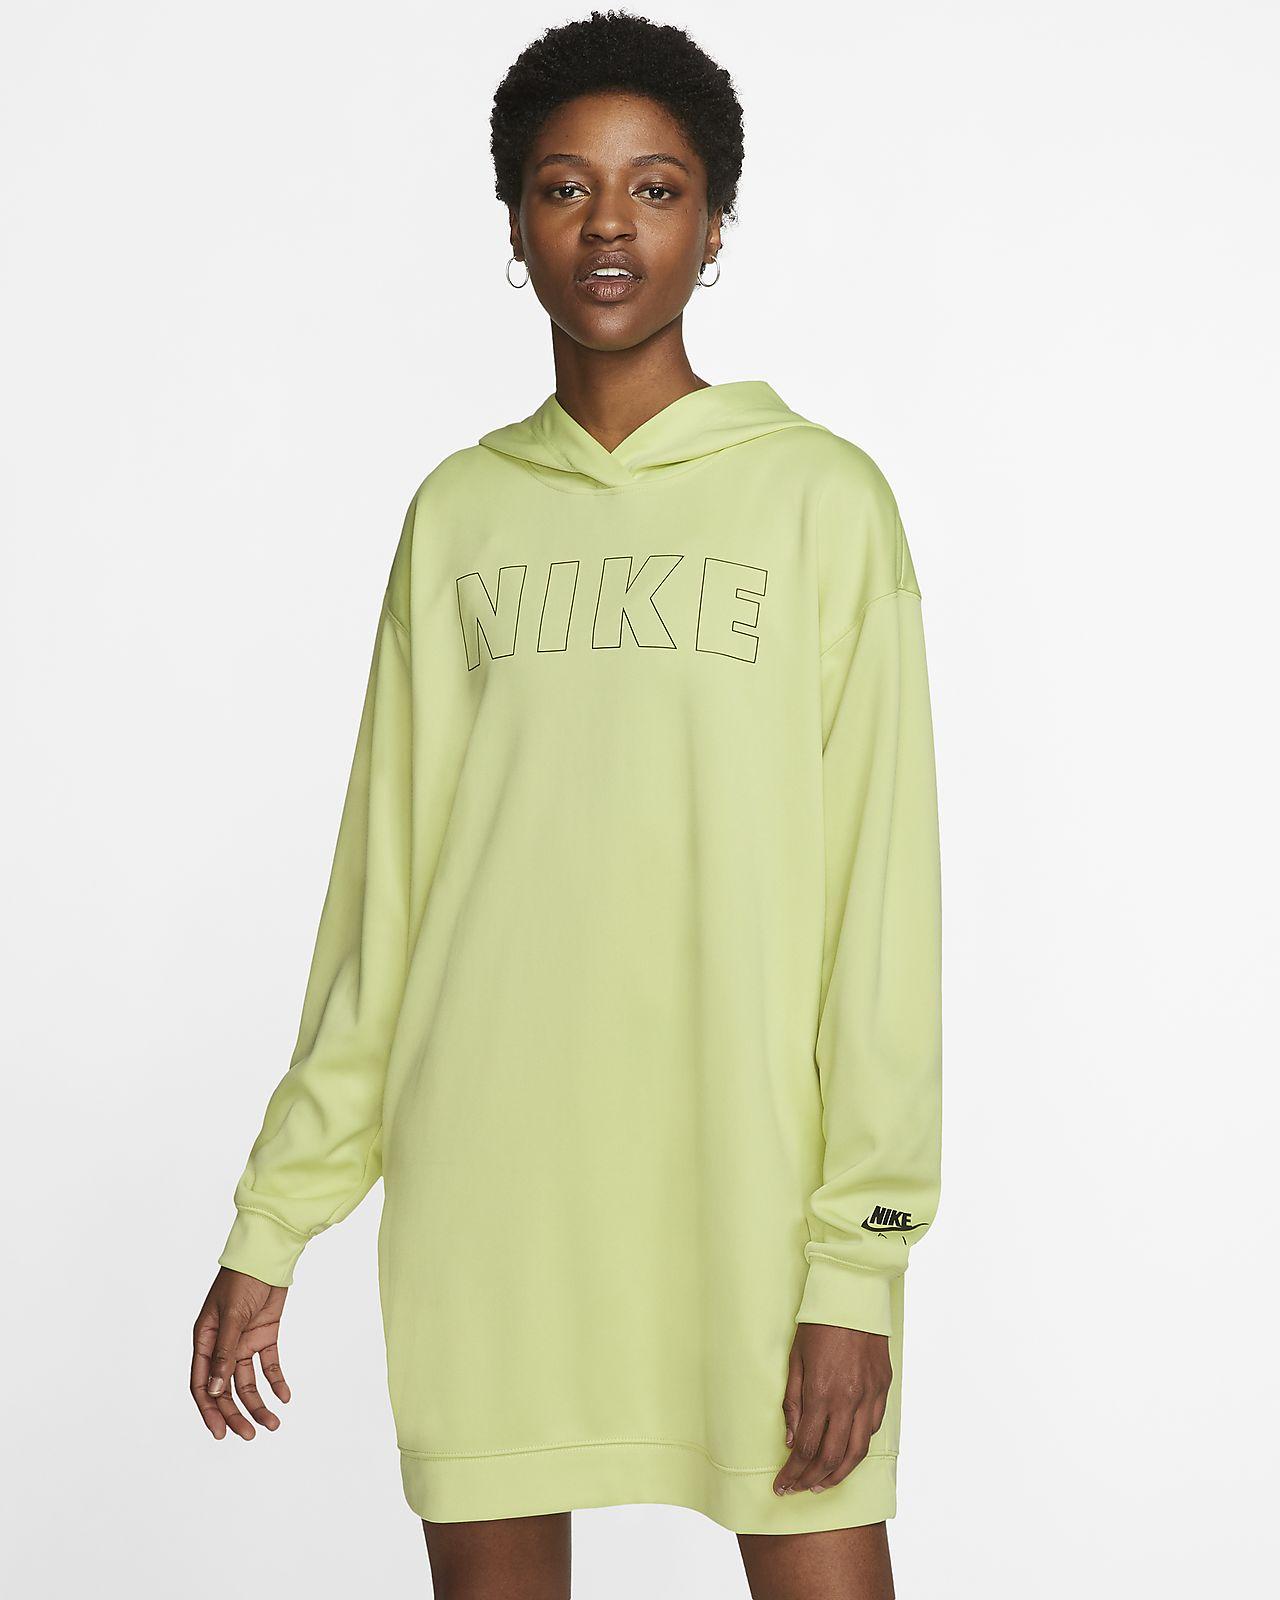 damen sweatshirt kleid with pockets wholesale 771ef 66fbb